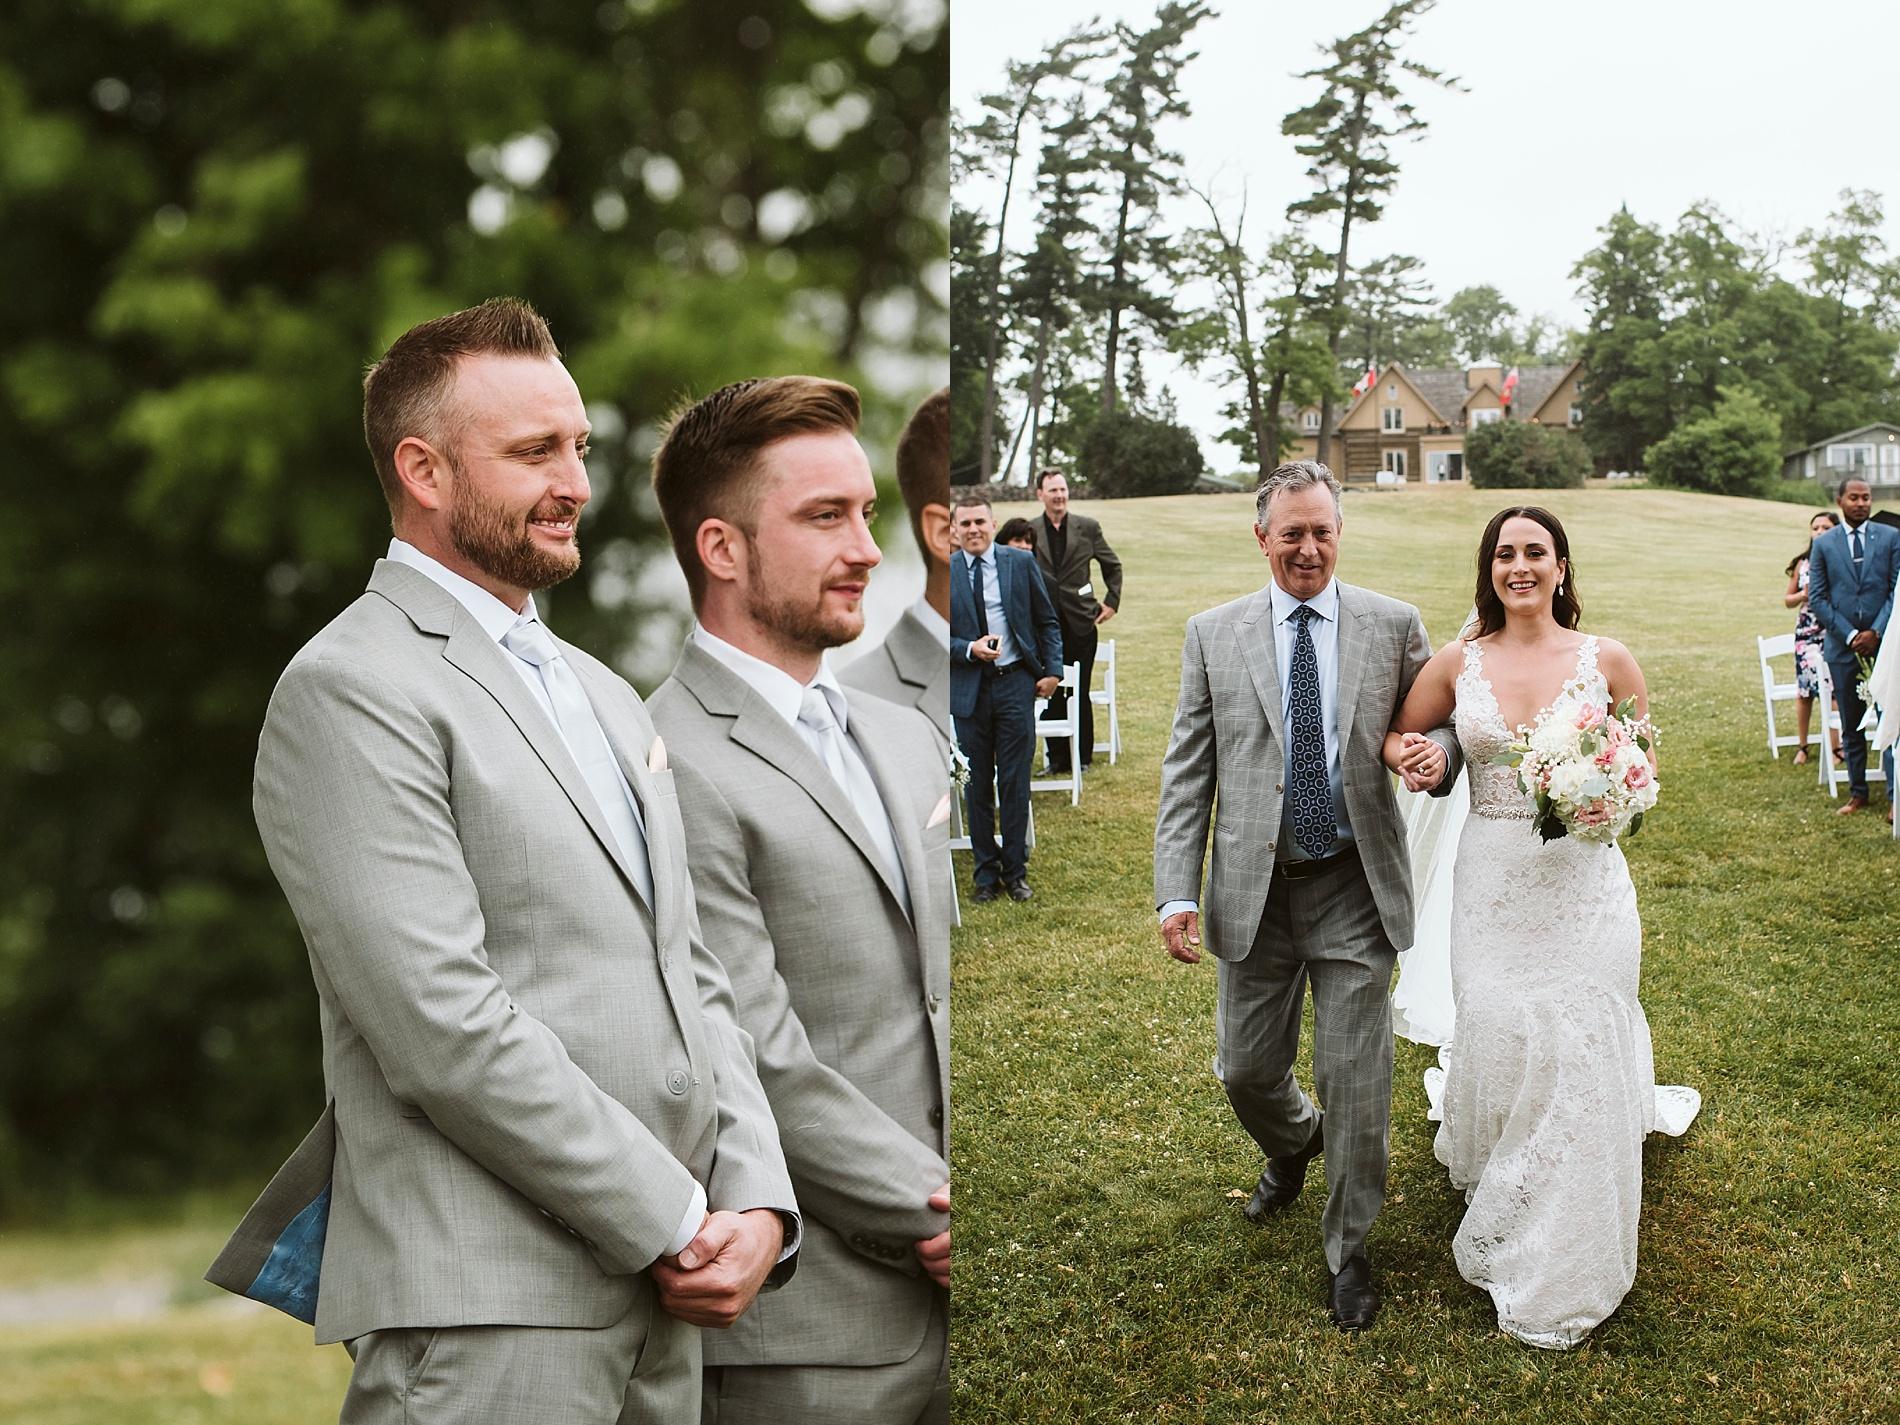 Kawartha_Lakes_Wedding_Bobcageon_Eganridge_Resort_Toronto_Photographer_0033.jpg